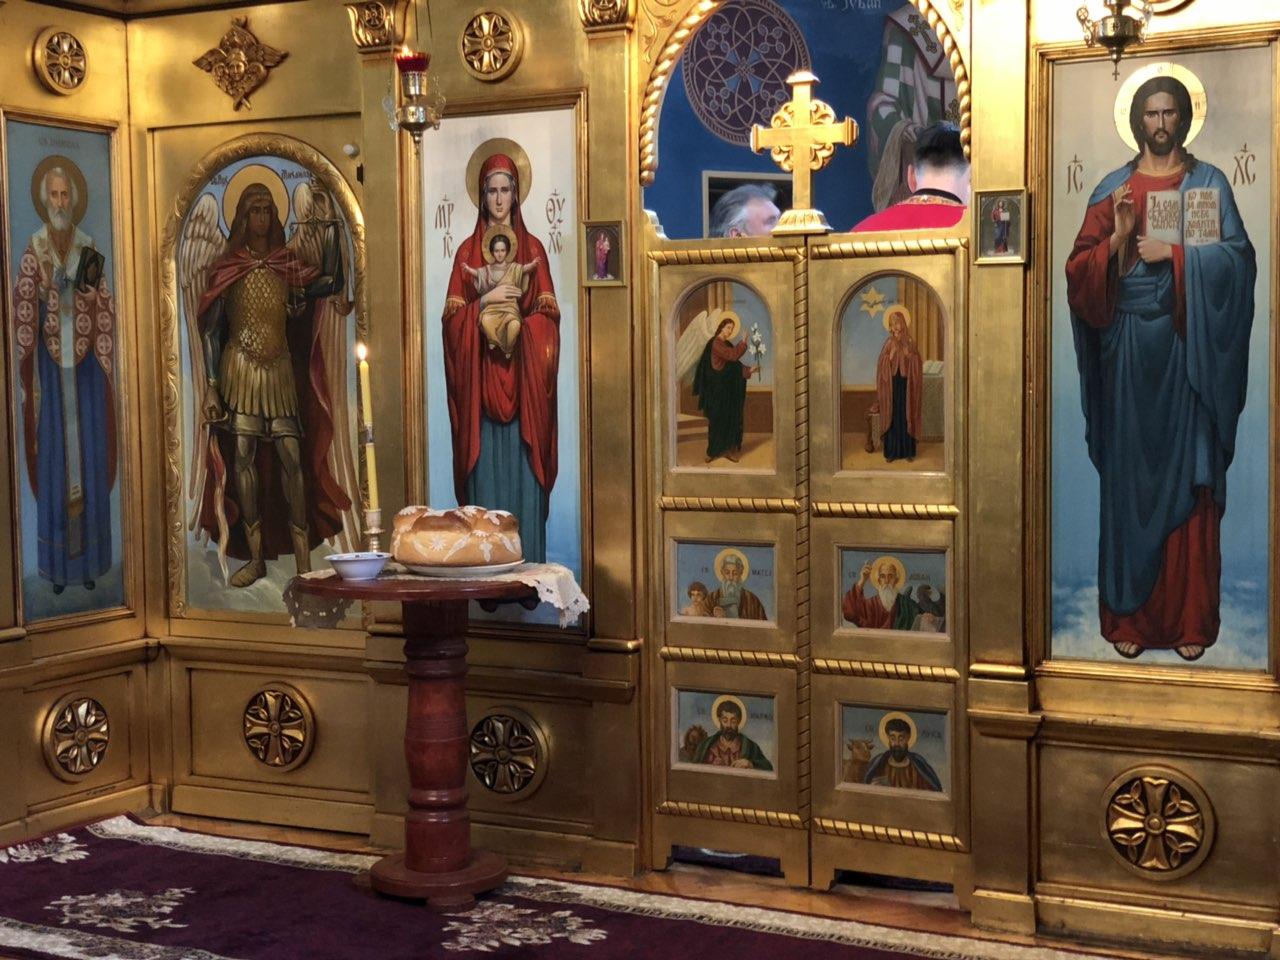 Црква у Сврљигу, фото: М.М.